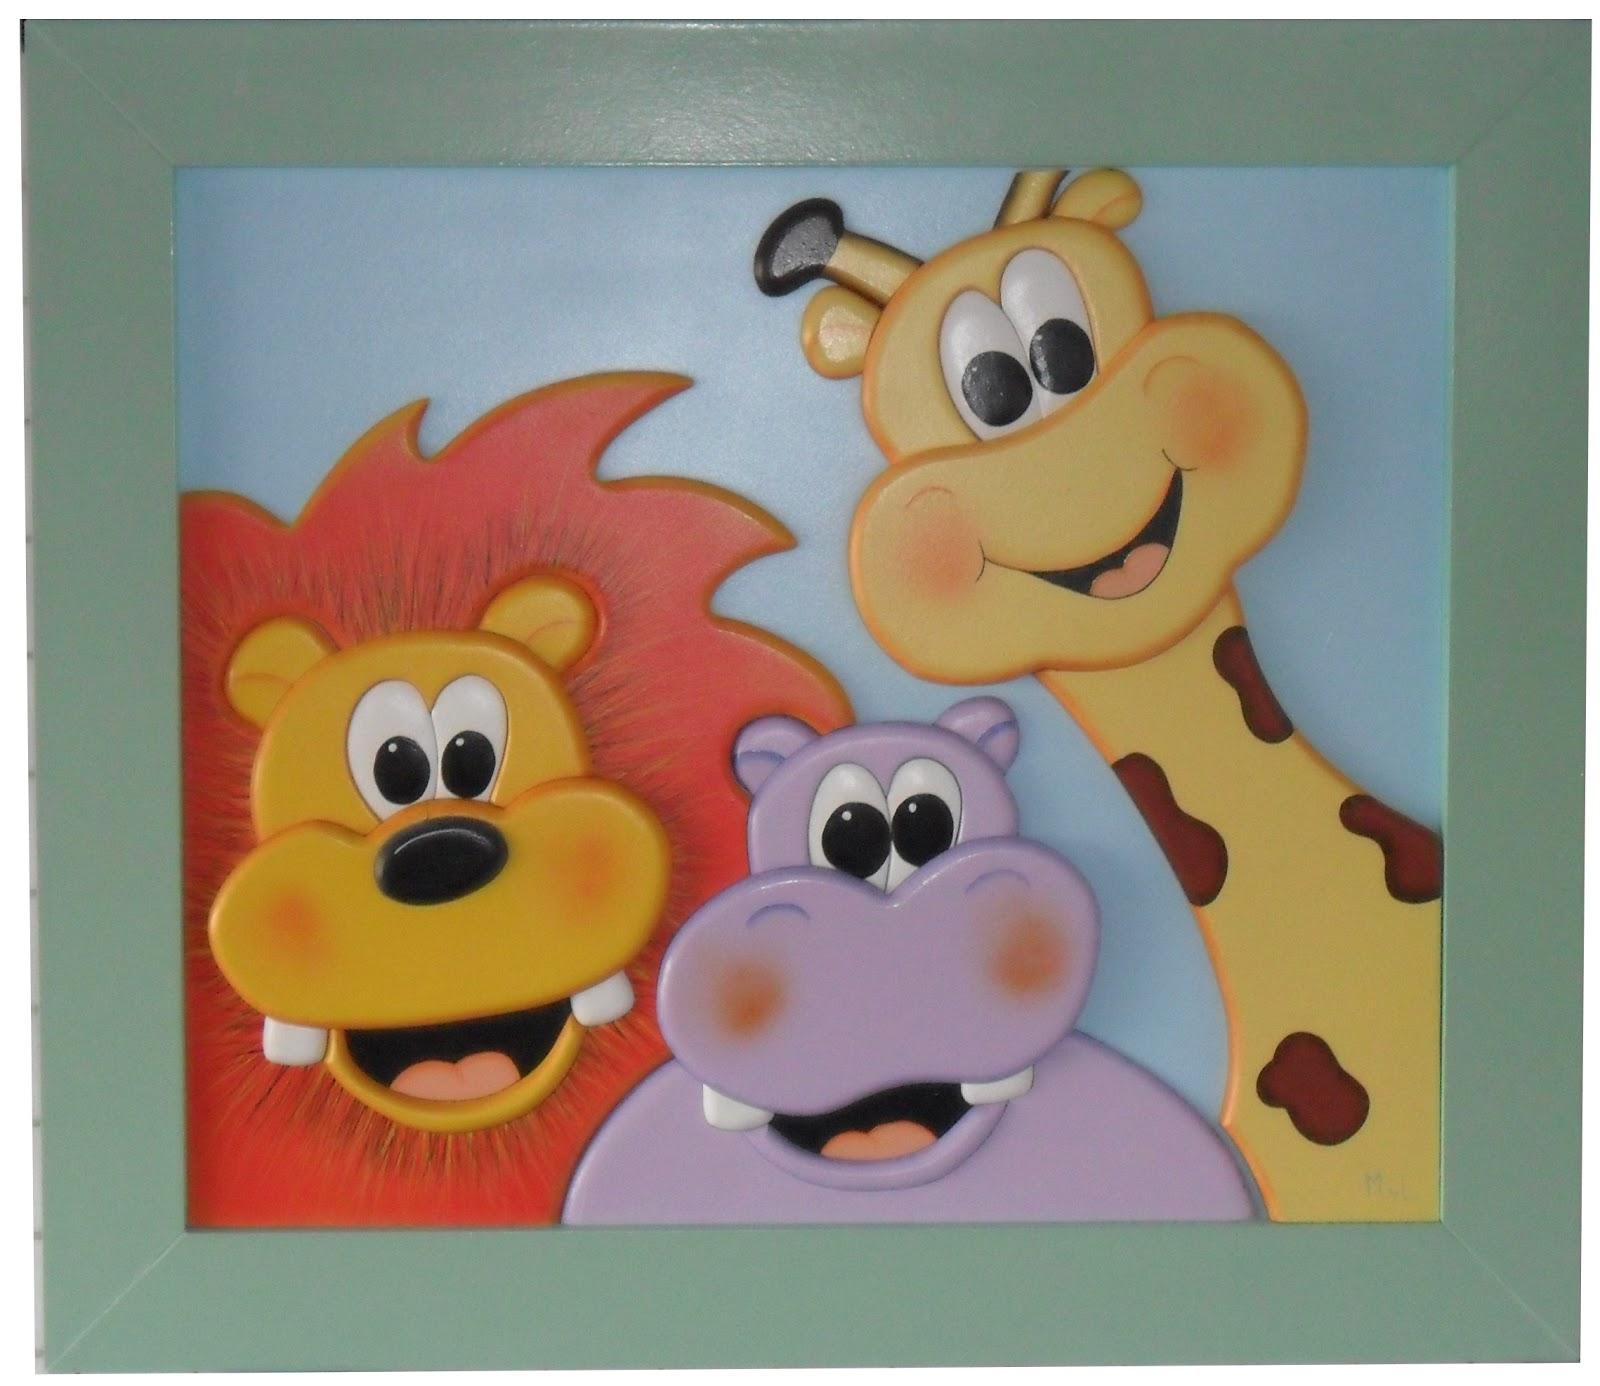 Myl cuadros en madera de relieve cuadros infantiles unisex - Percheros infantiles de pared ...